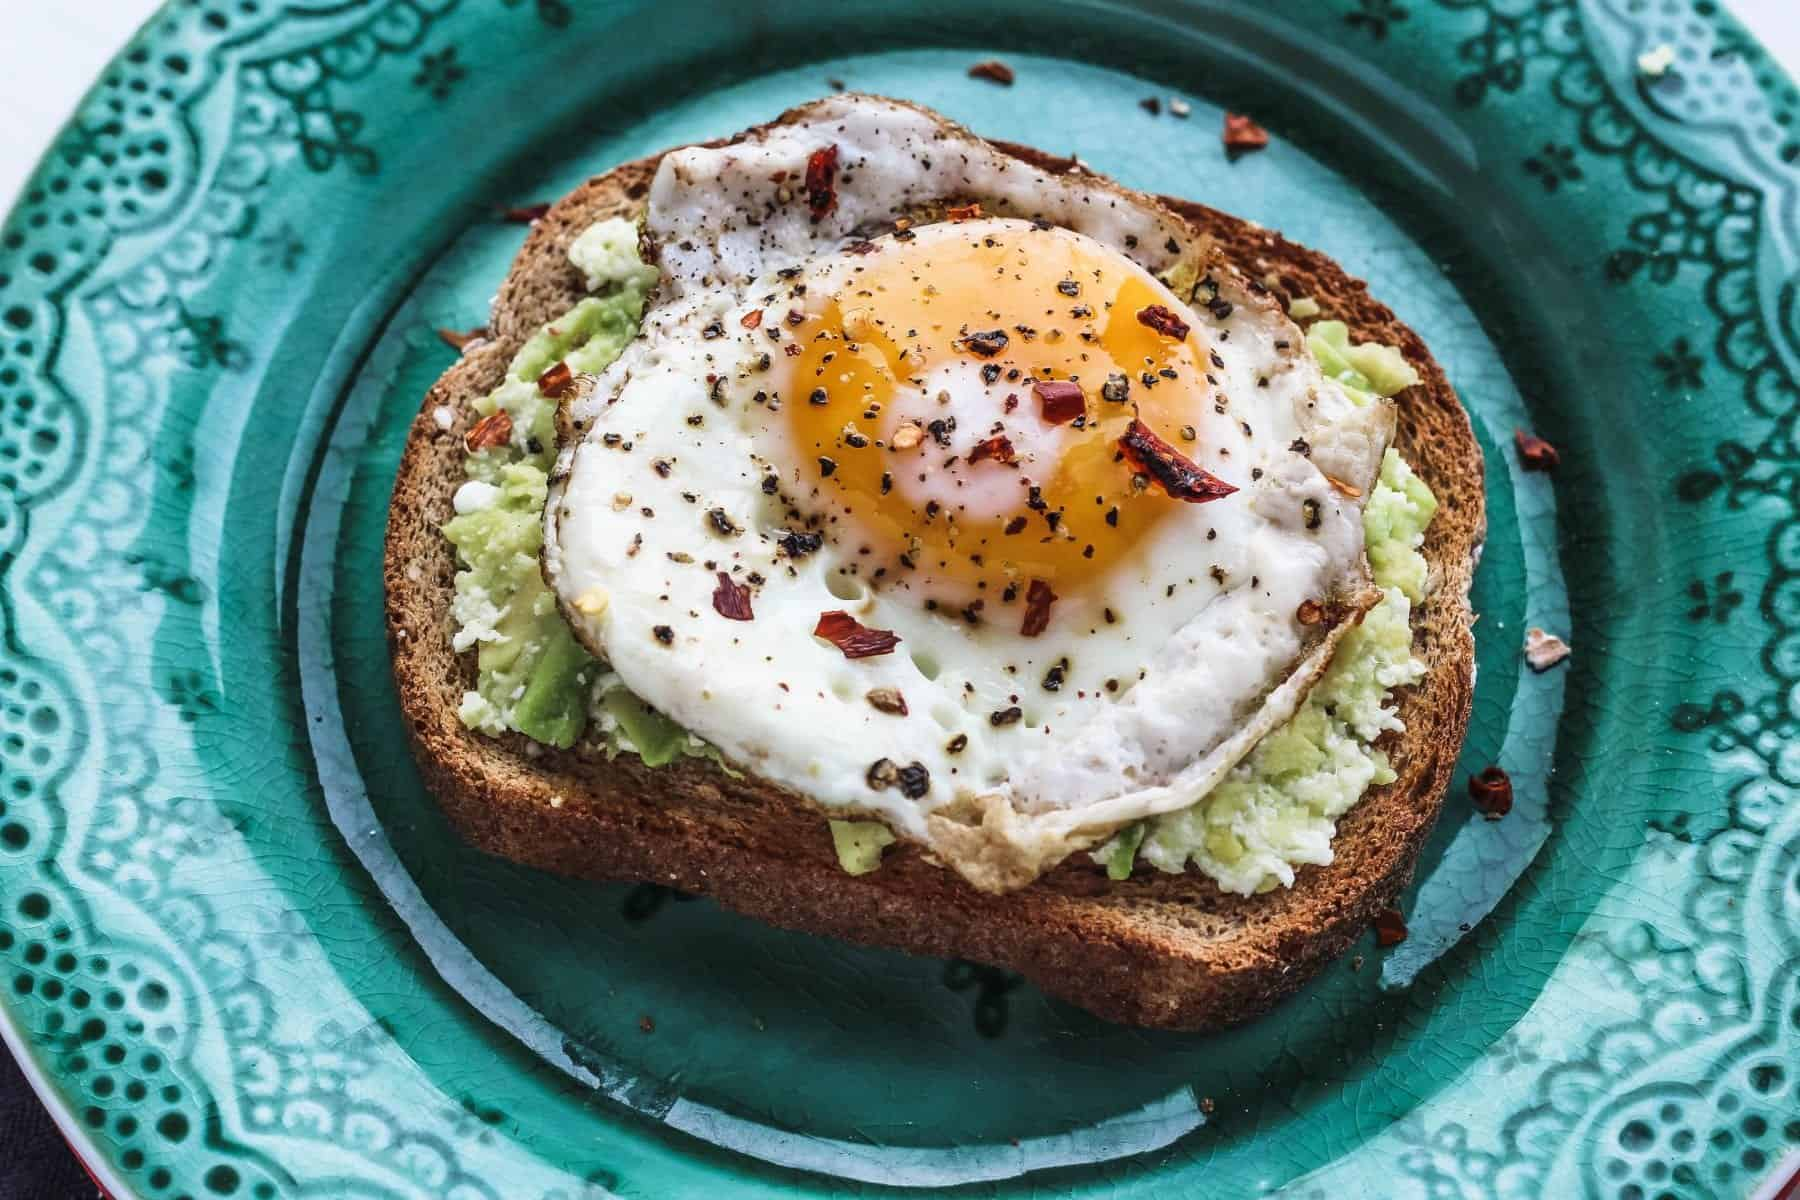 Avocado Toast with Fried Egg, Avocado Toast with Egg